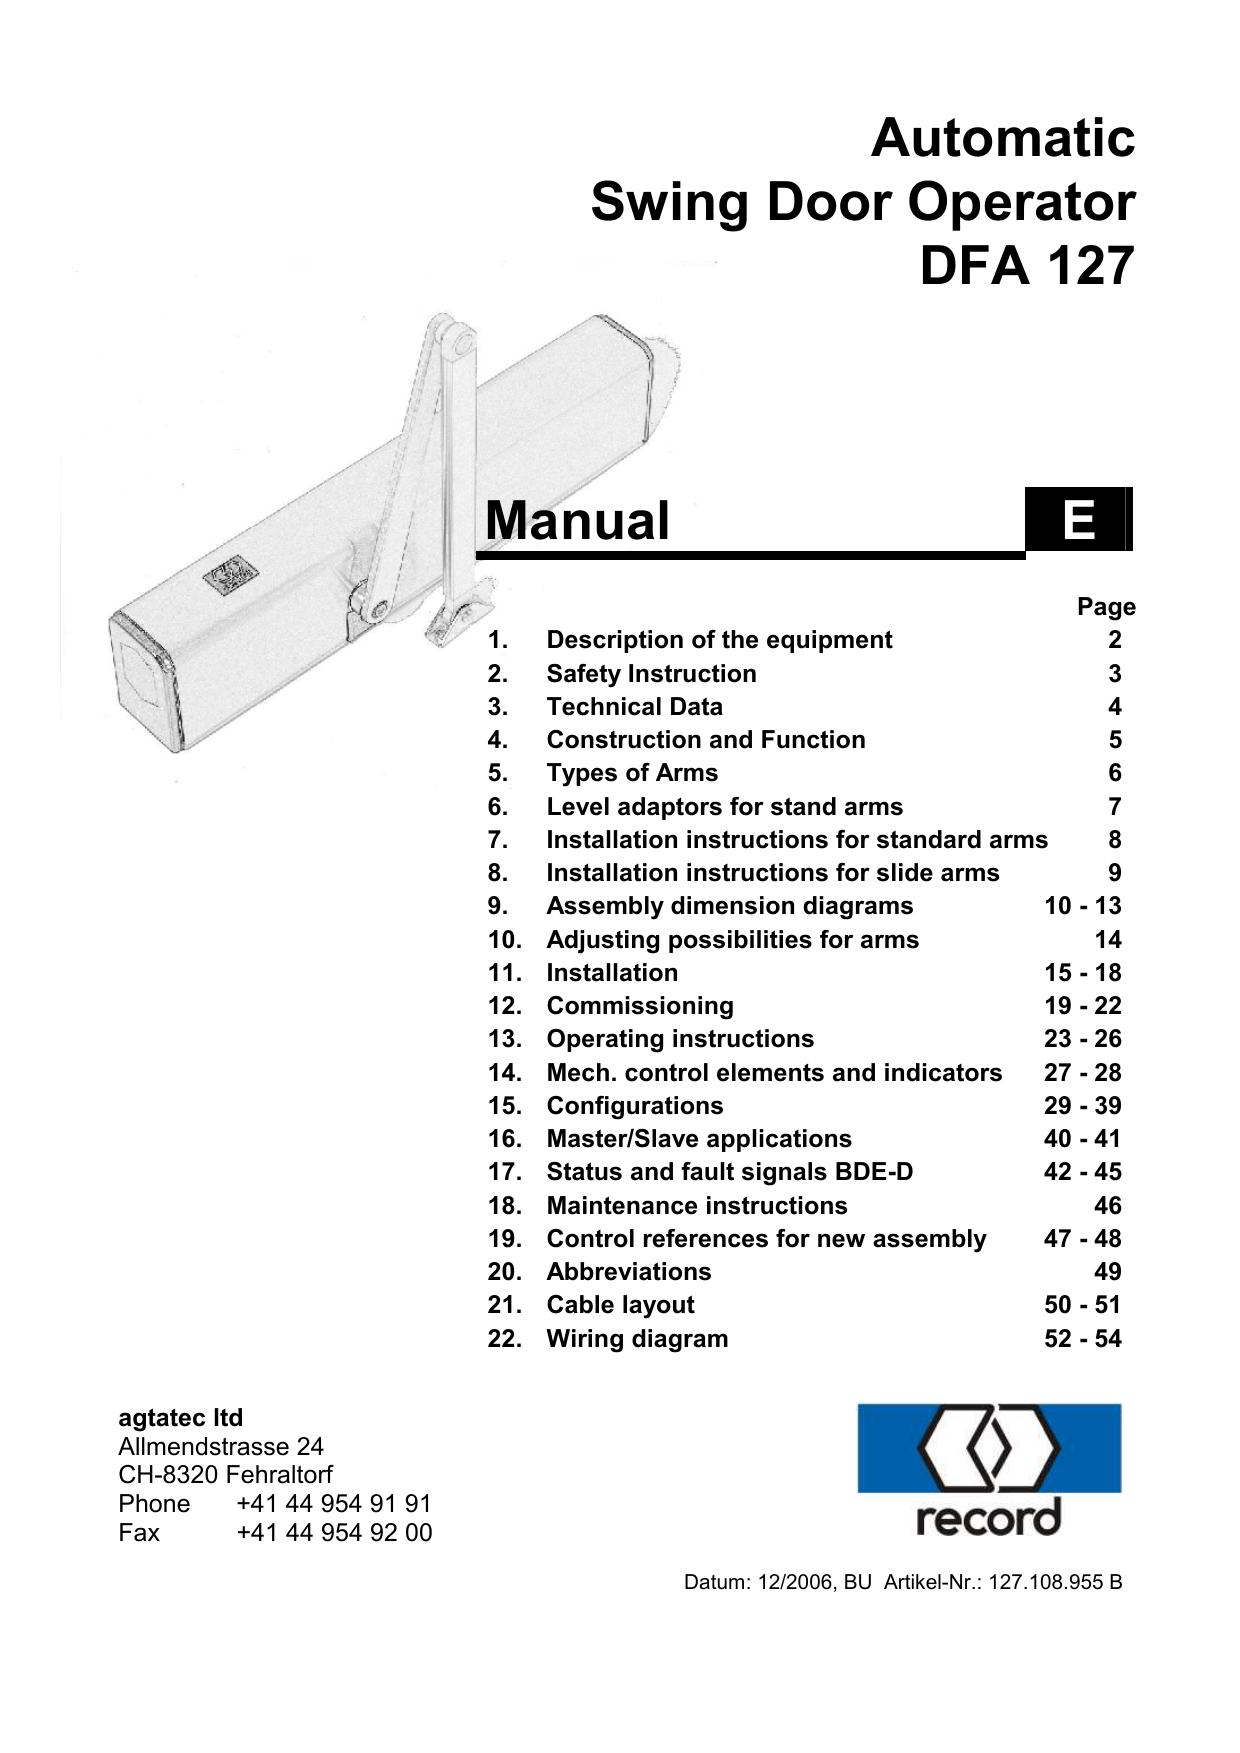 Record Dfa 127 Wiring Diagram on